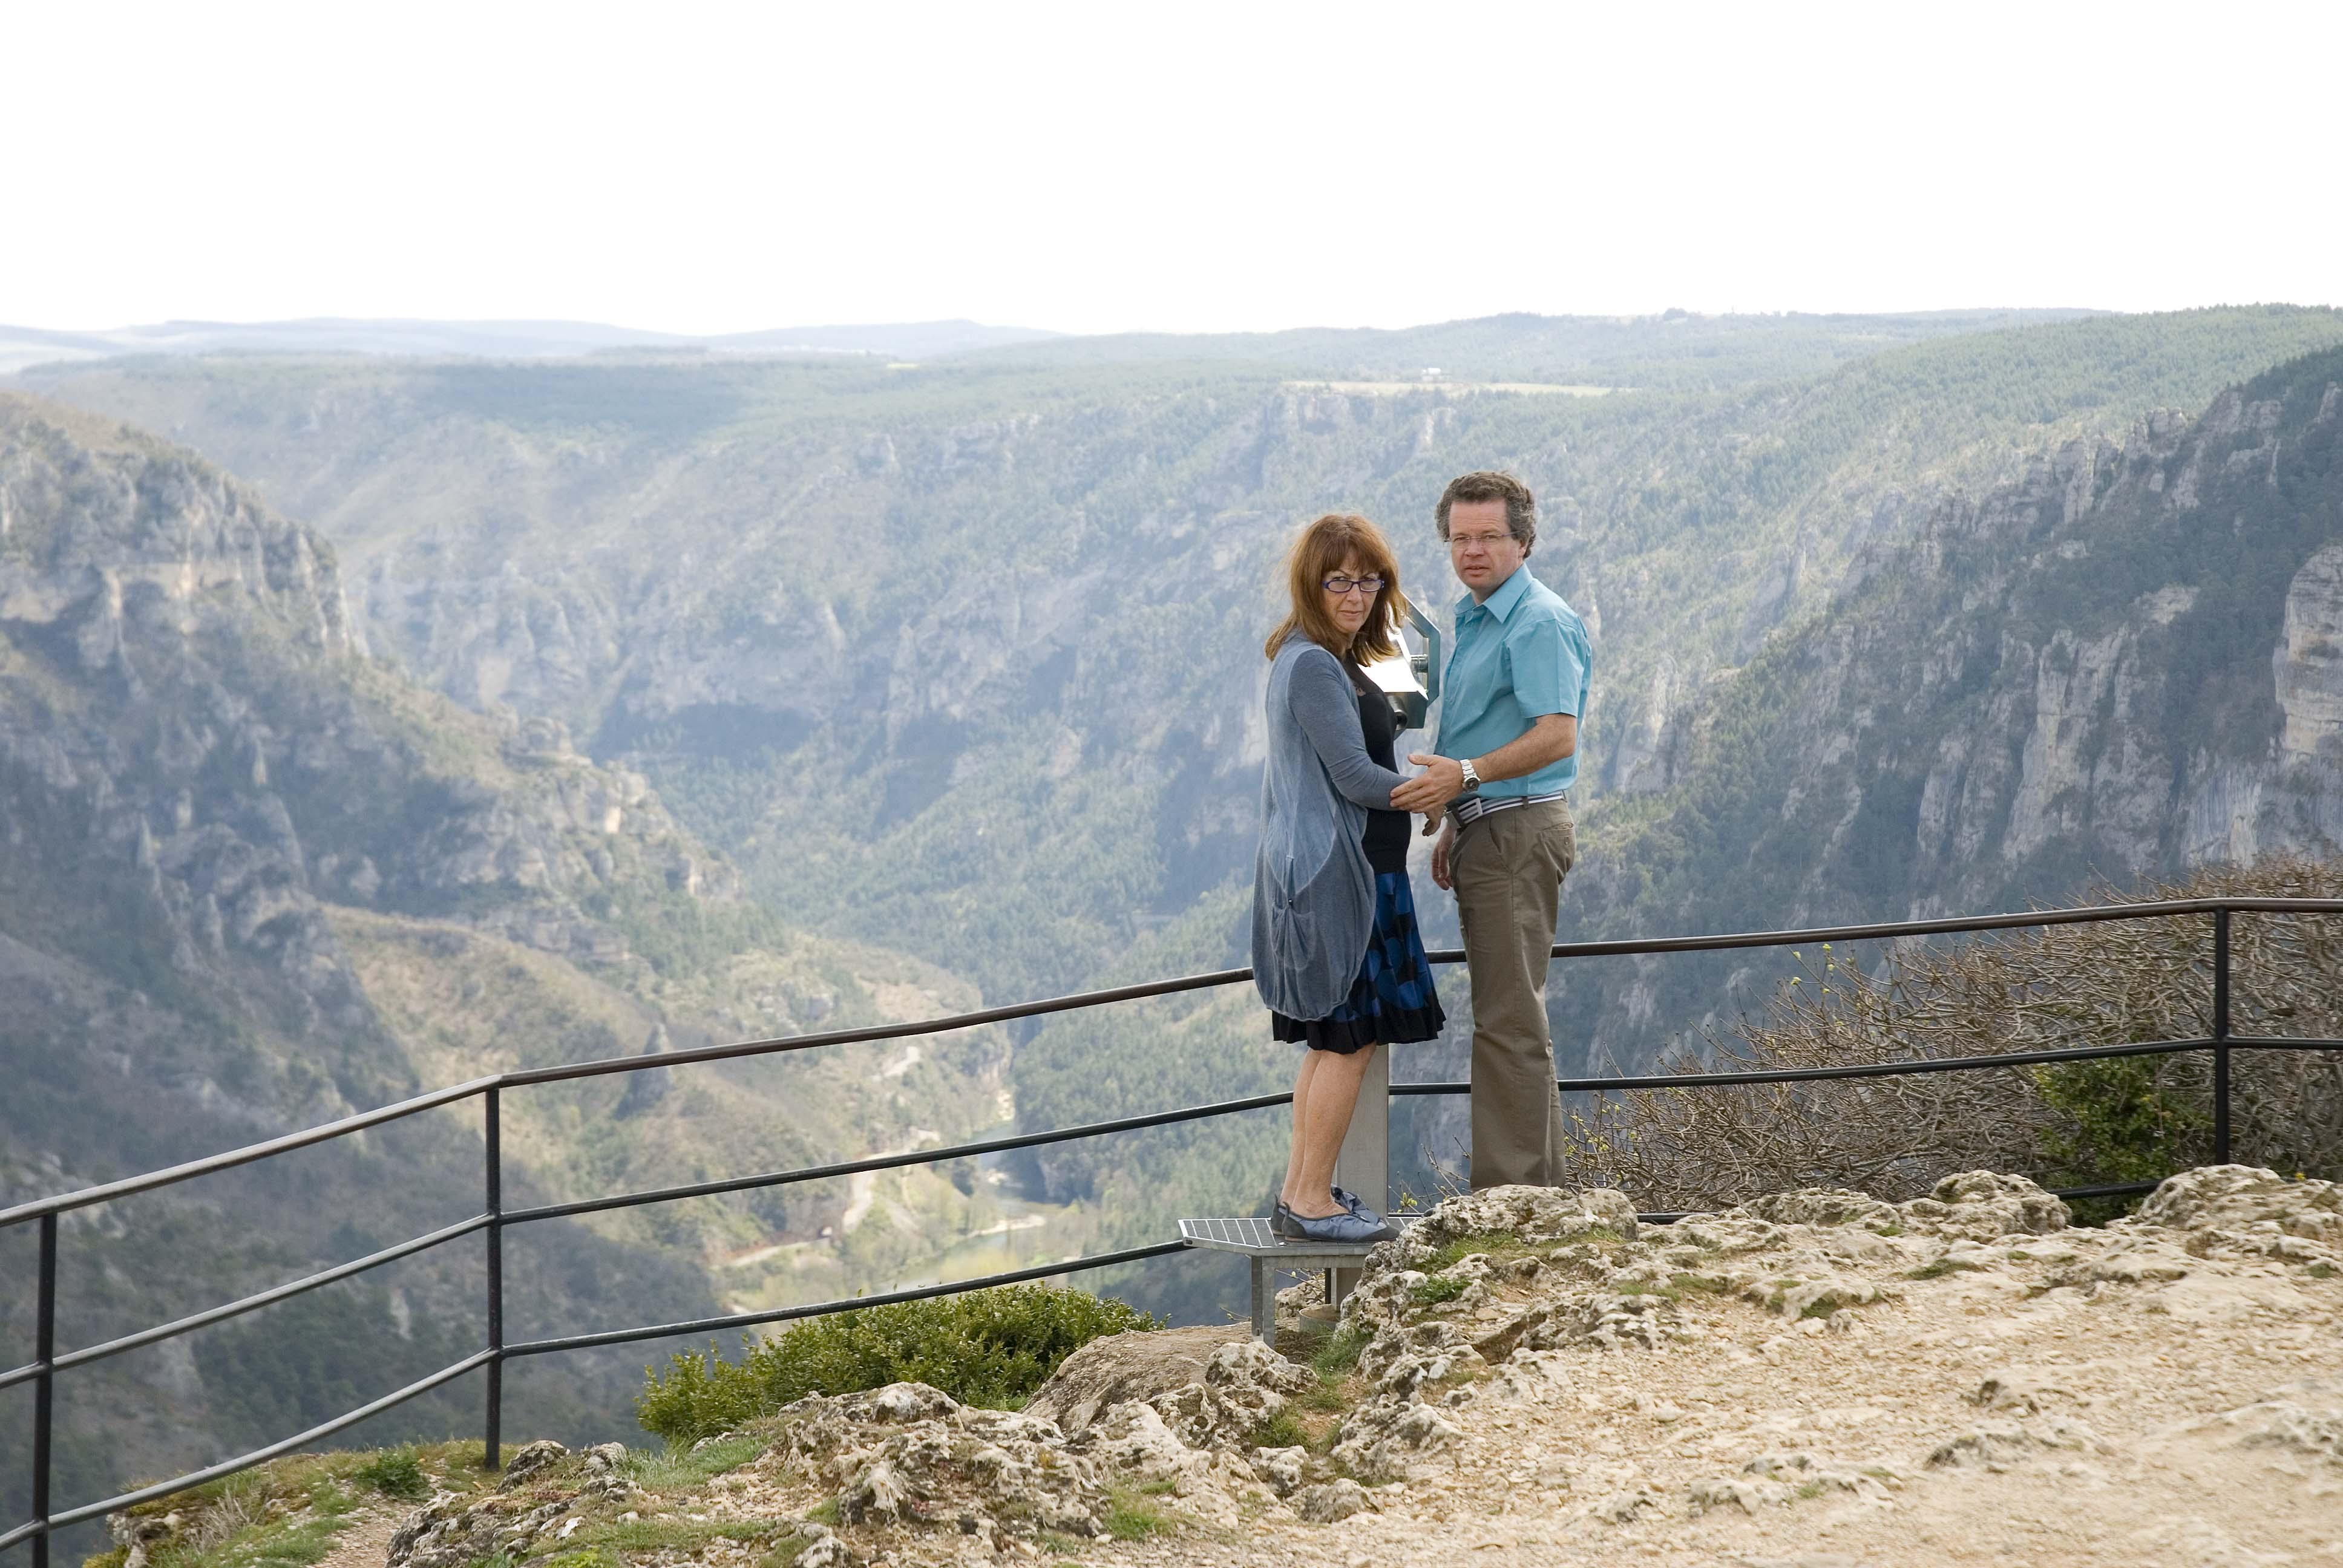 _JF12678-Gorges du Tarn-Point sublime